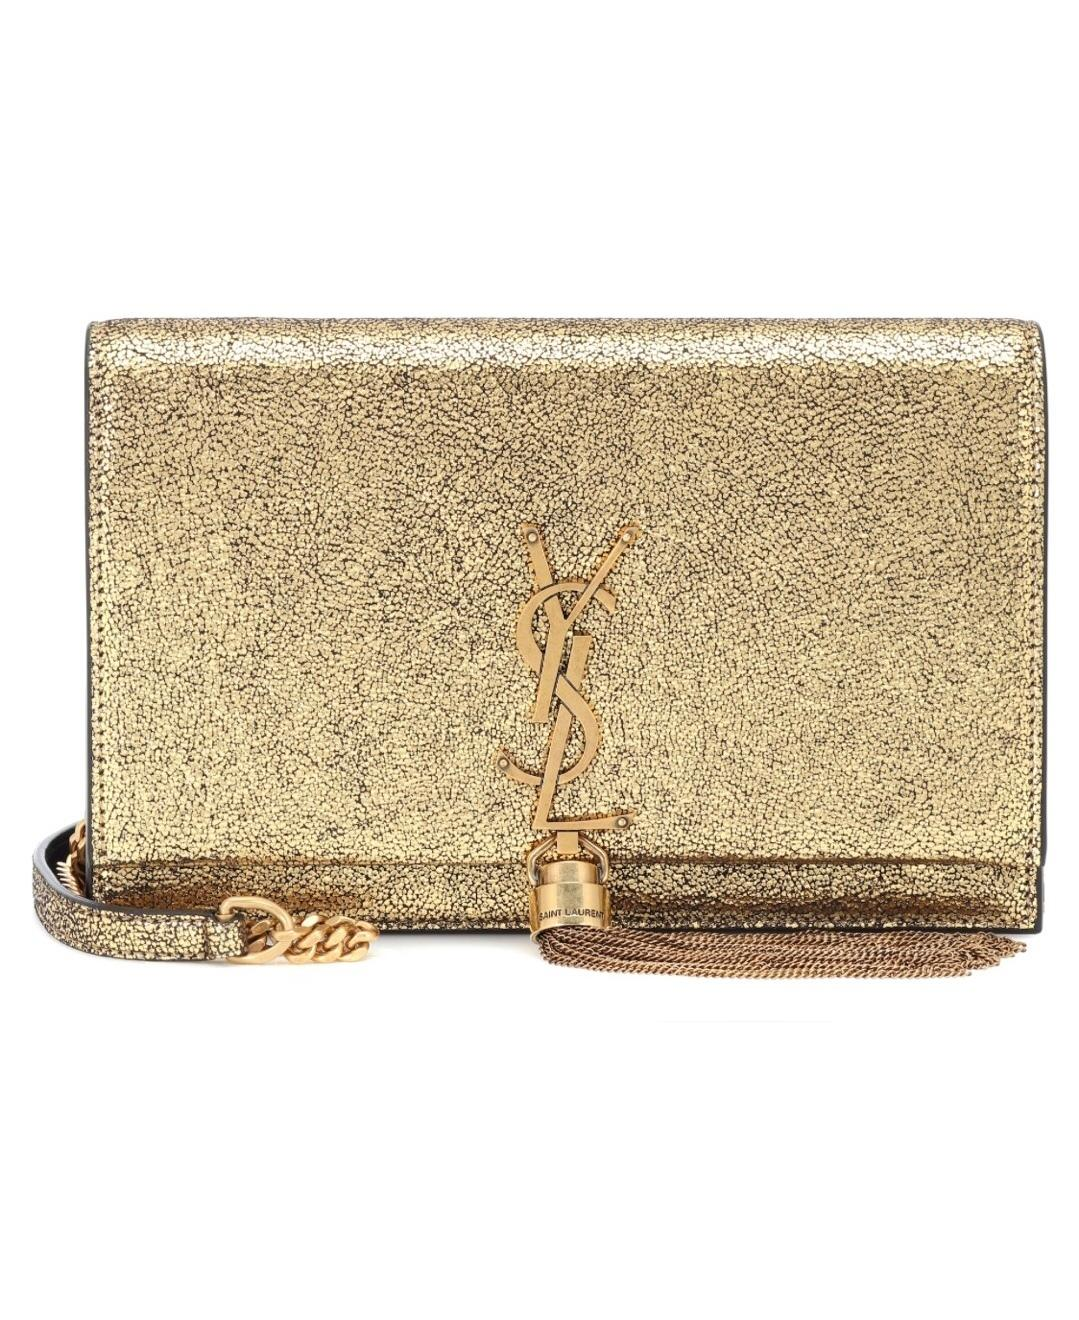 6259cc6383 Champagne YSL Tassel Bag